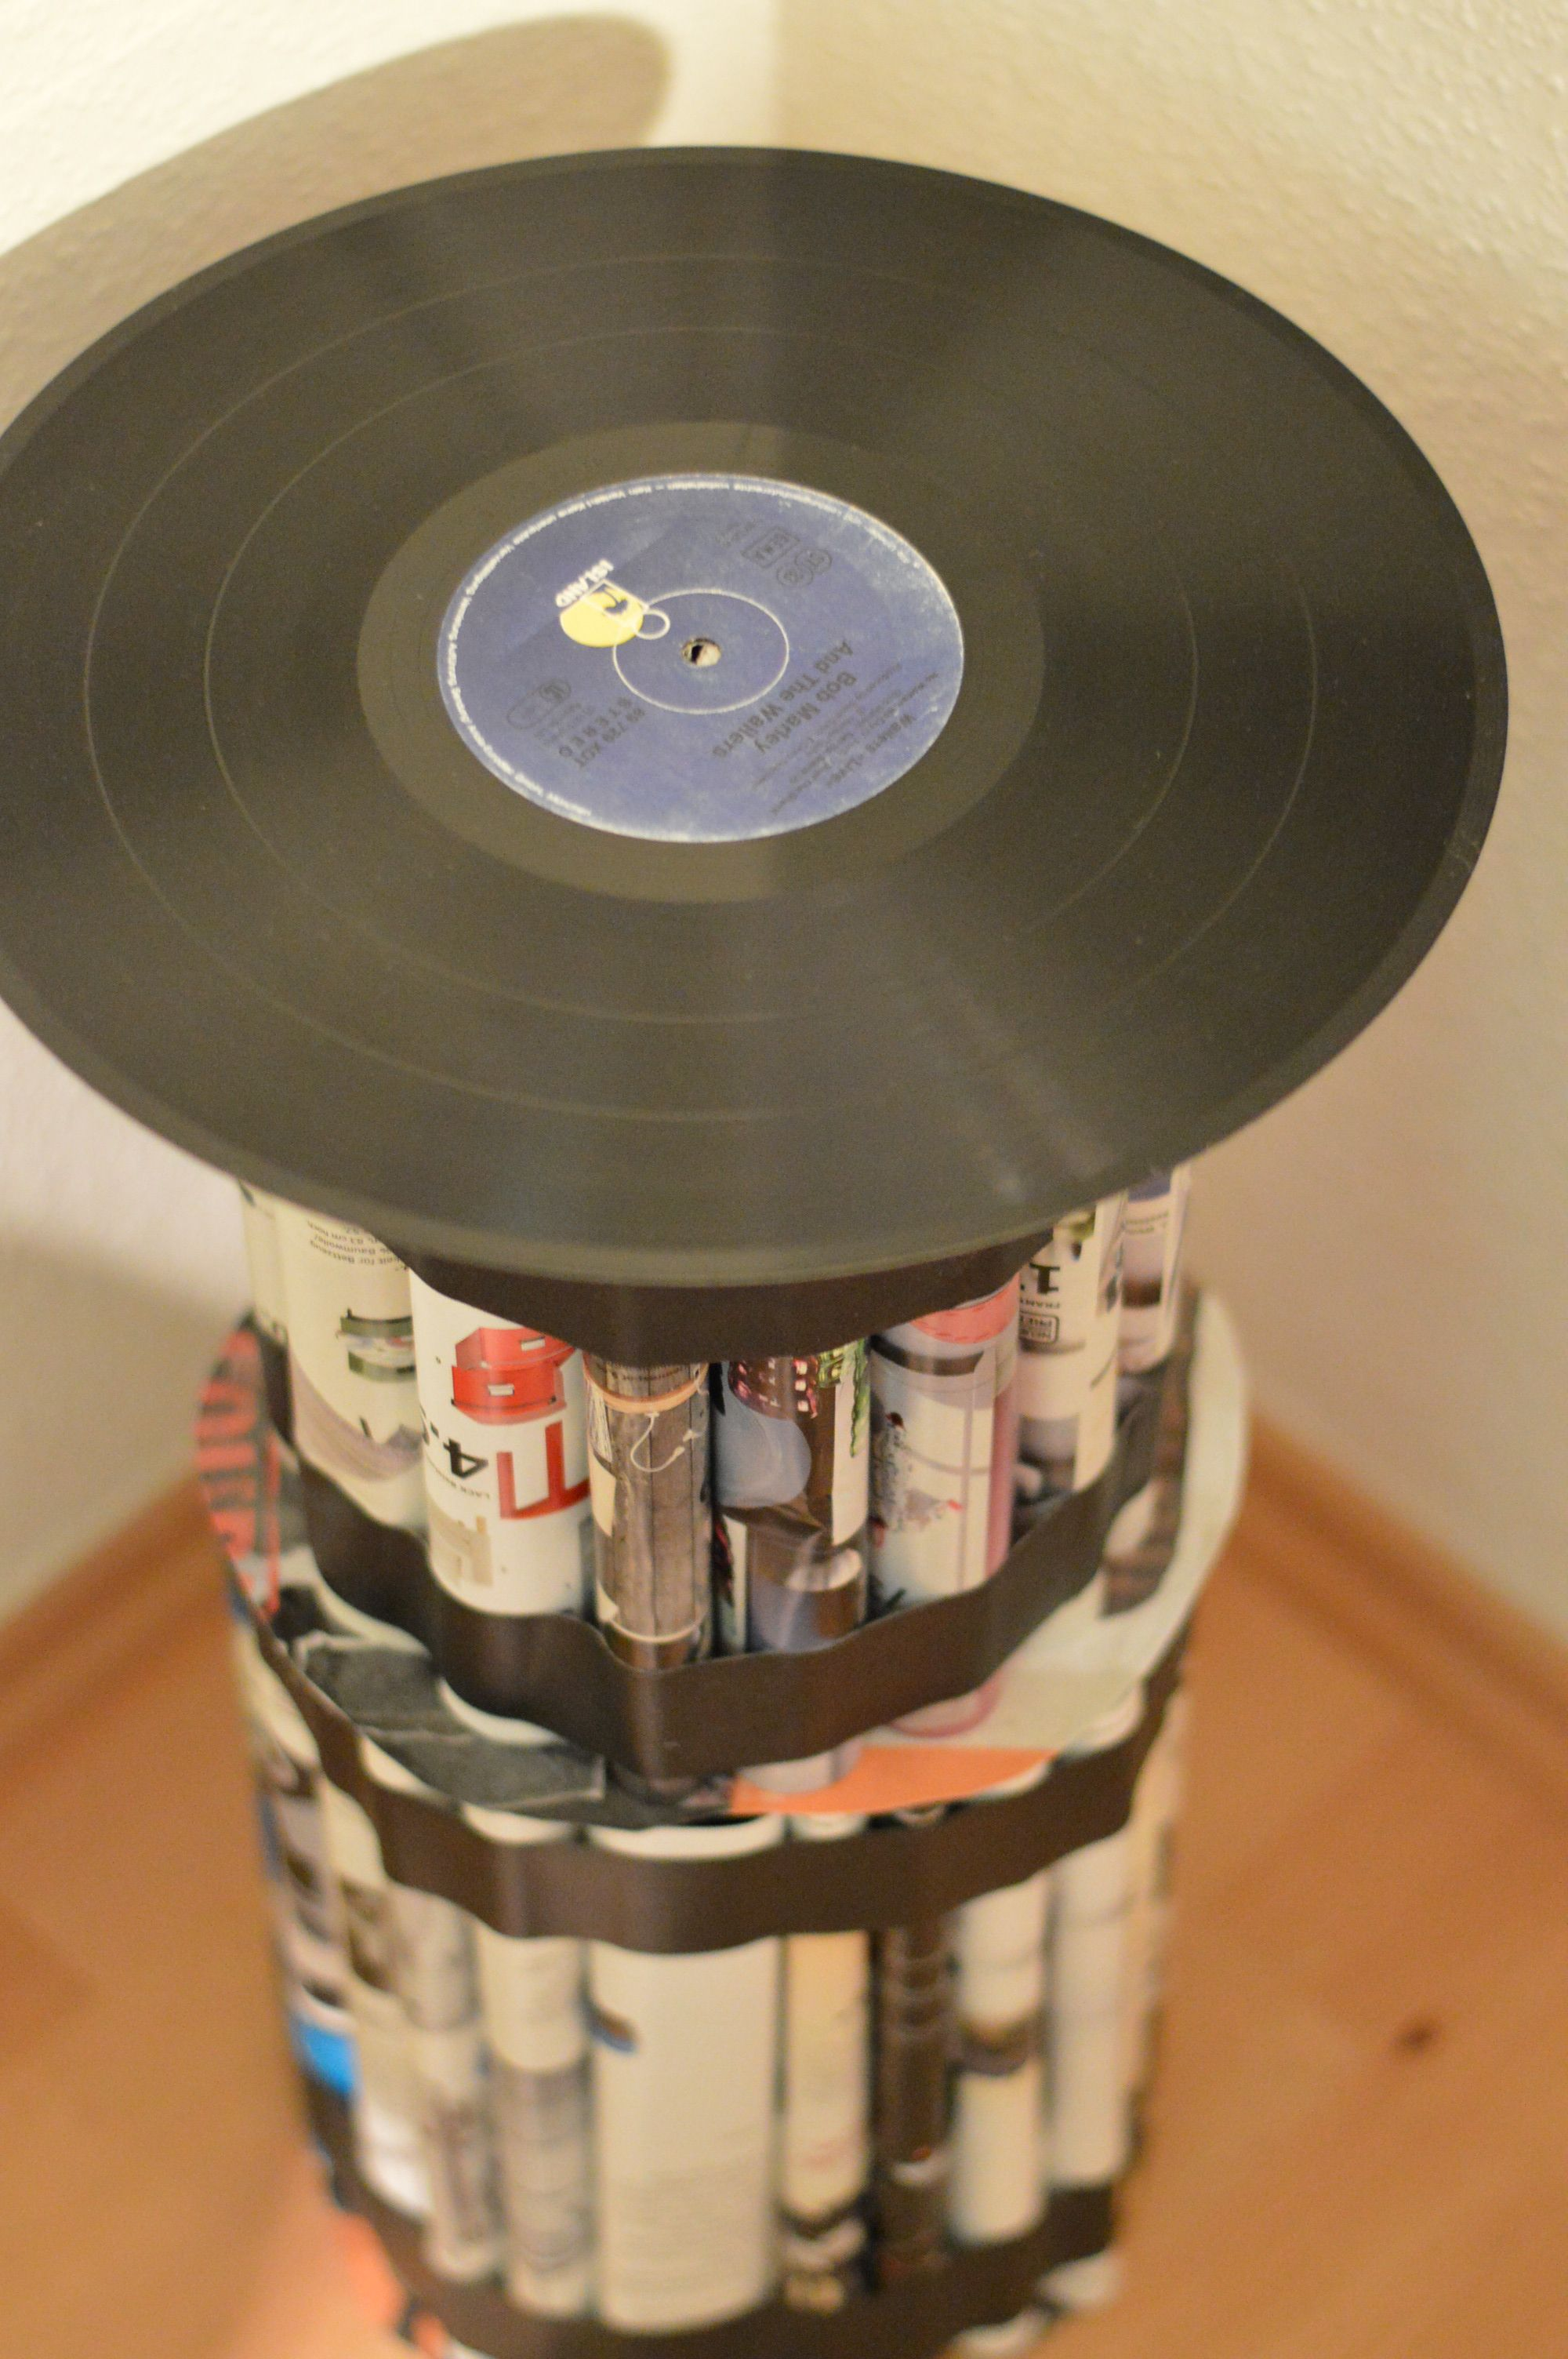 Upcycling Table Tisch Magazine Record Schallplatte | DIY | Pinterest ...